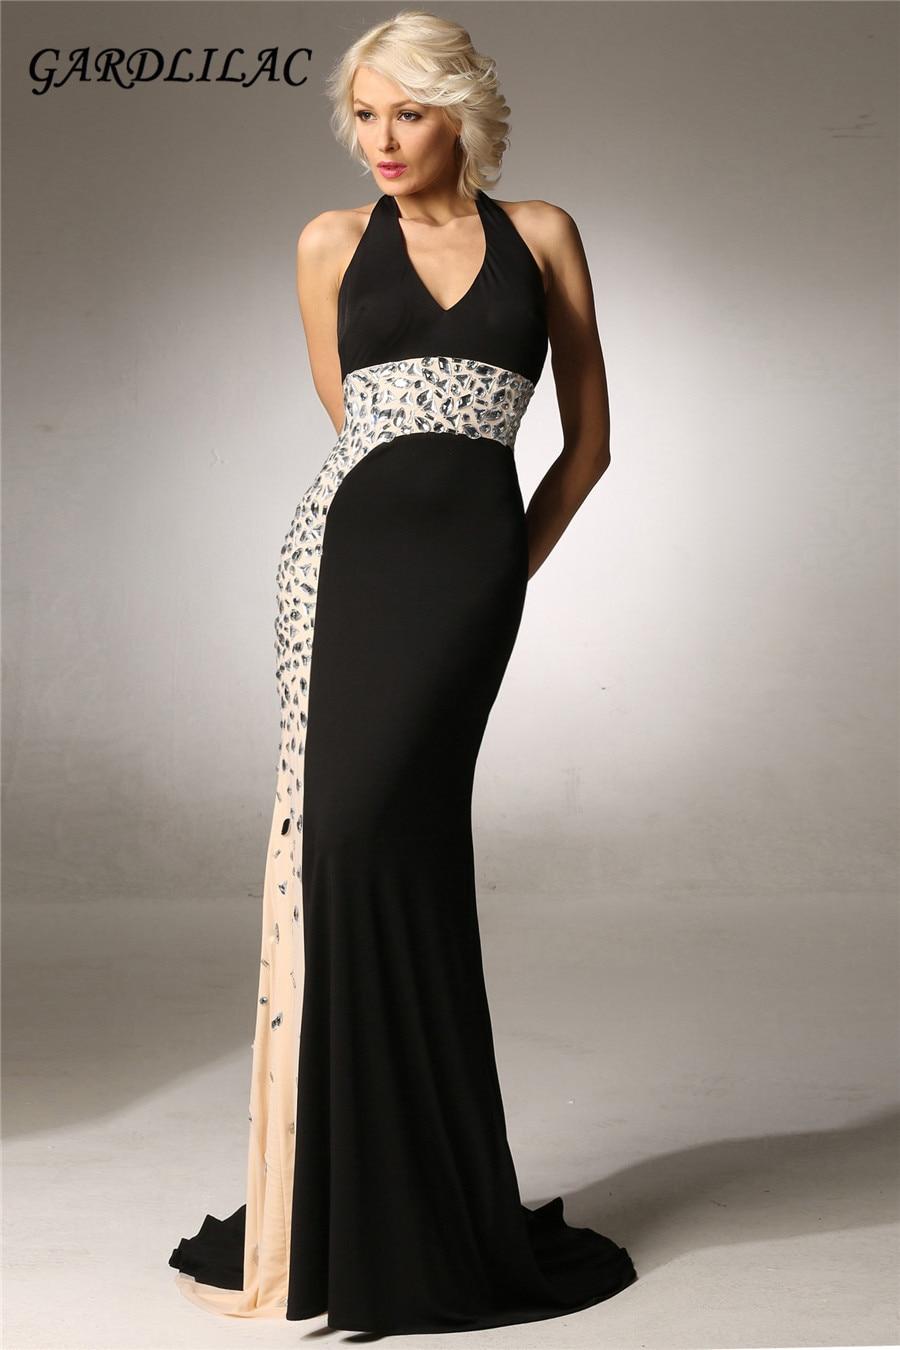 Gardlilas mousseline de soie licou noir robe de soirée longue avec perles sexy dos nu court train robes de soirée sirène robe de soirée formelle